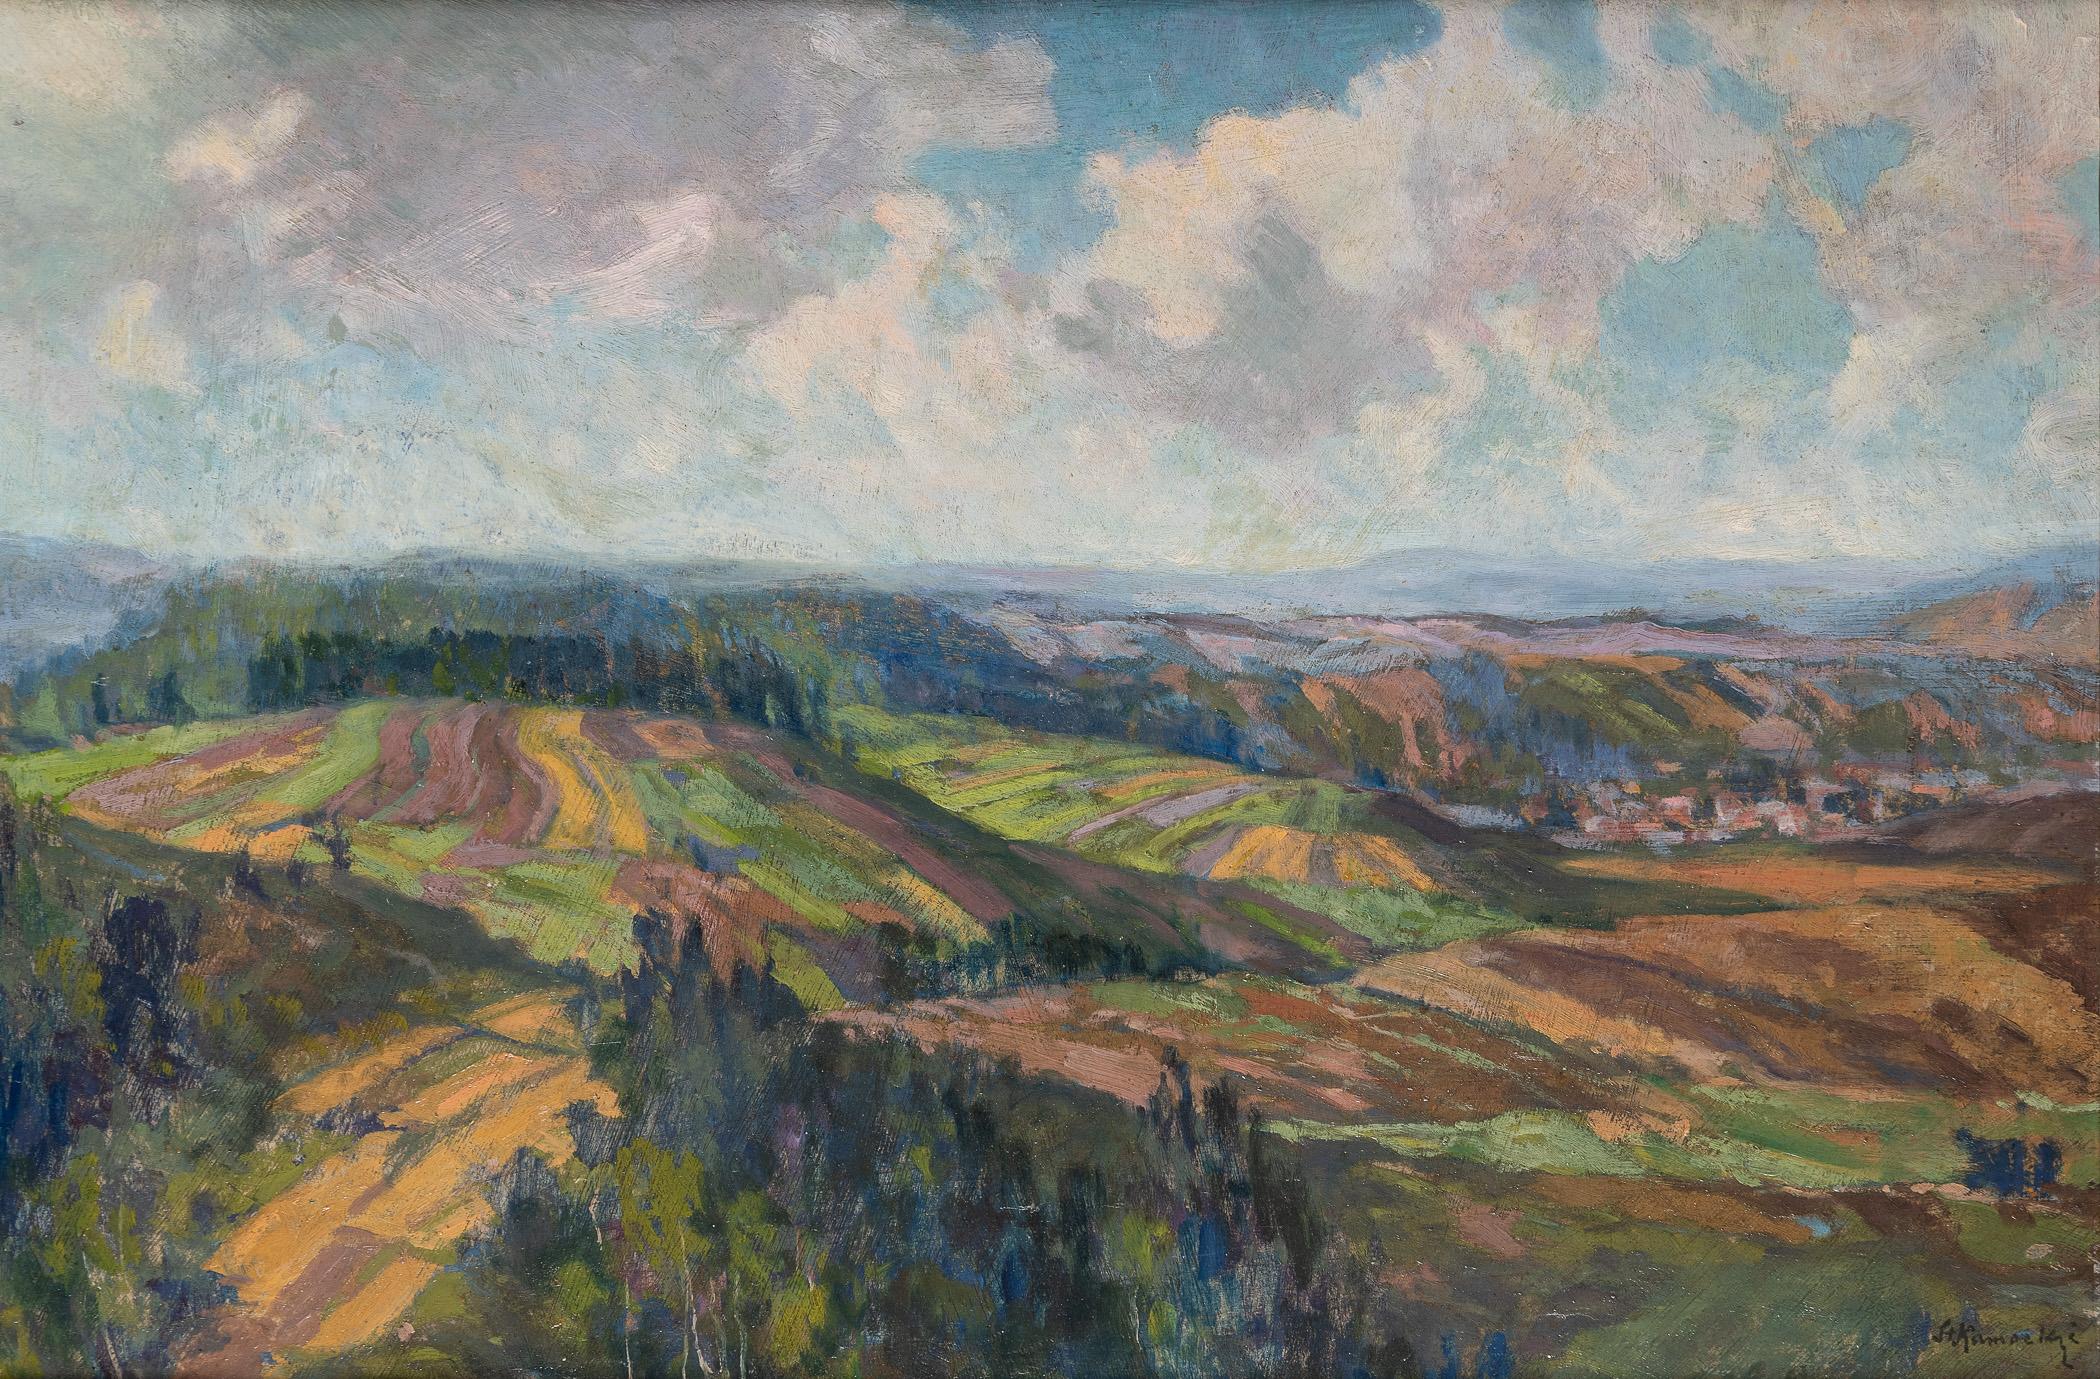 Pejzaż podgórski, ok. 1906